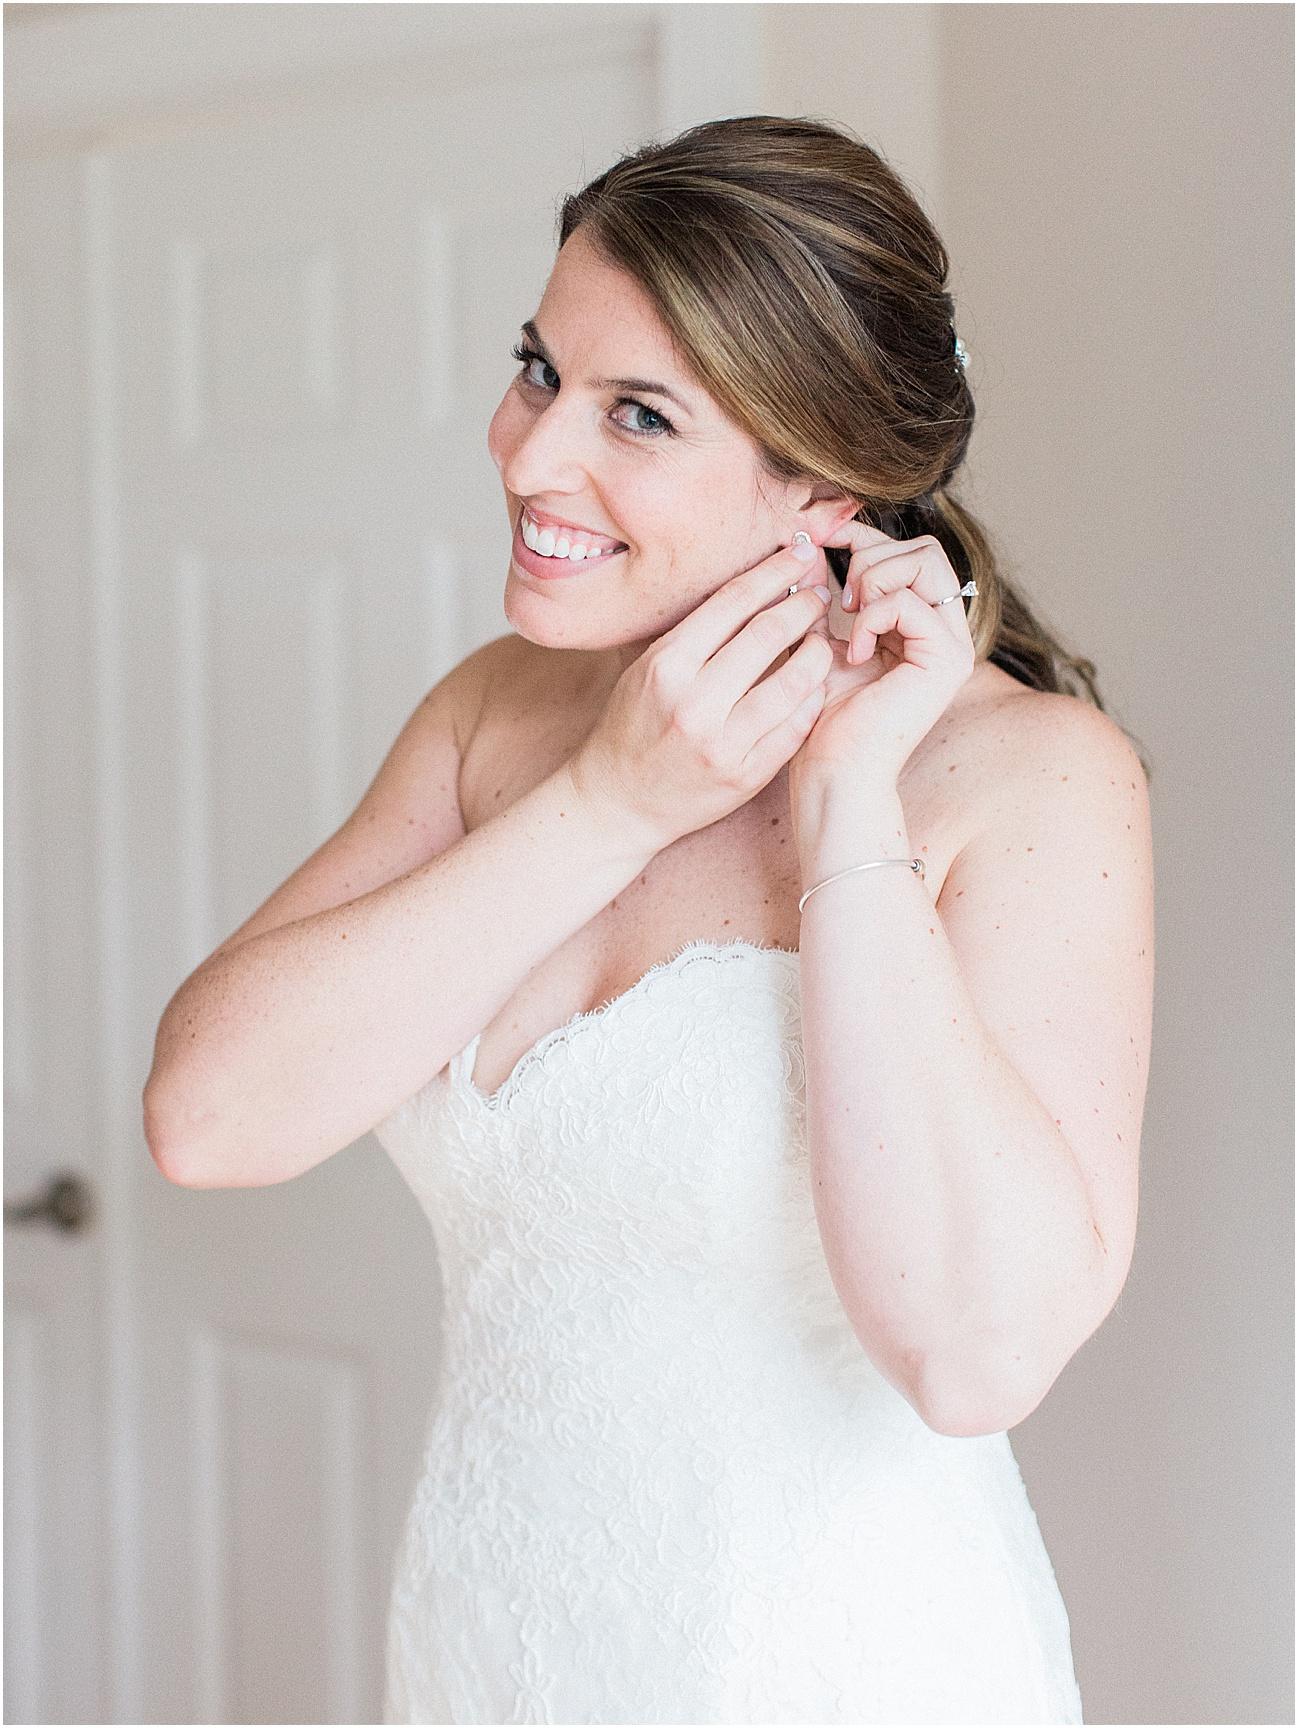 danielle_sean_willowbend_rain_rainy_day_cape_cod_boston_wedding_photographer_meredith_jane_photography_photo_1663.jpg